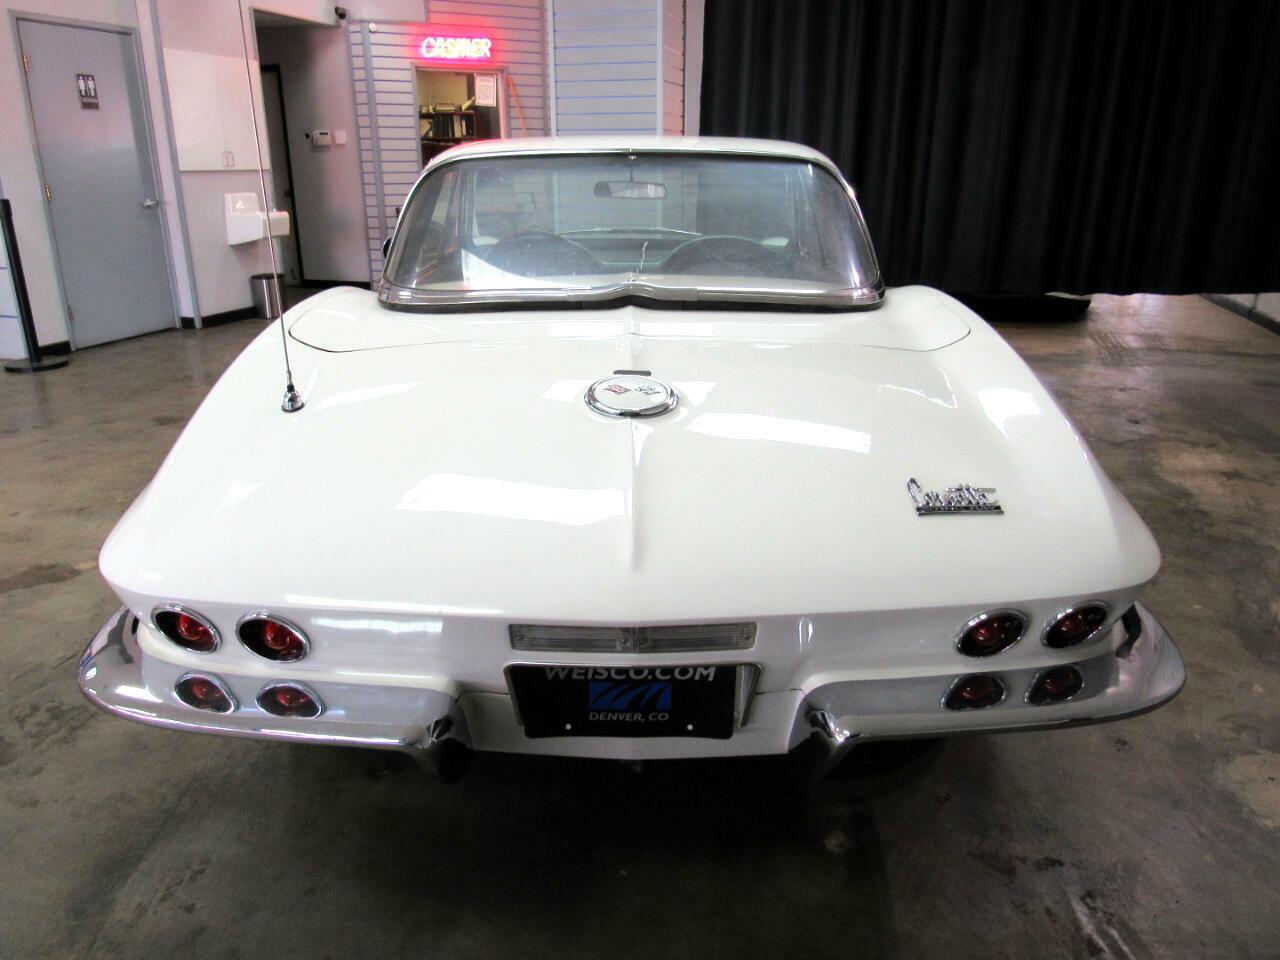 1967 White Chevrolet Corvette Convertible  | C2 Corvette Photo 6